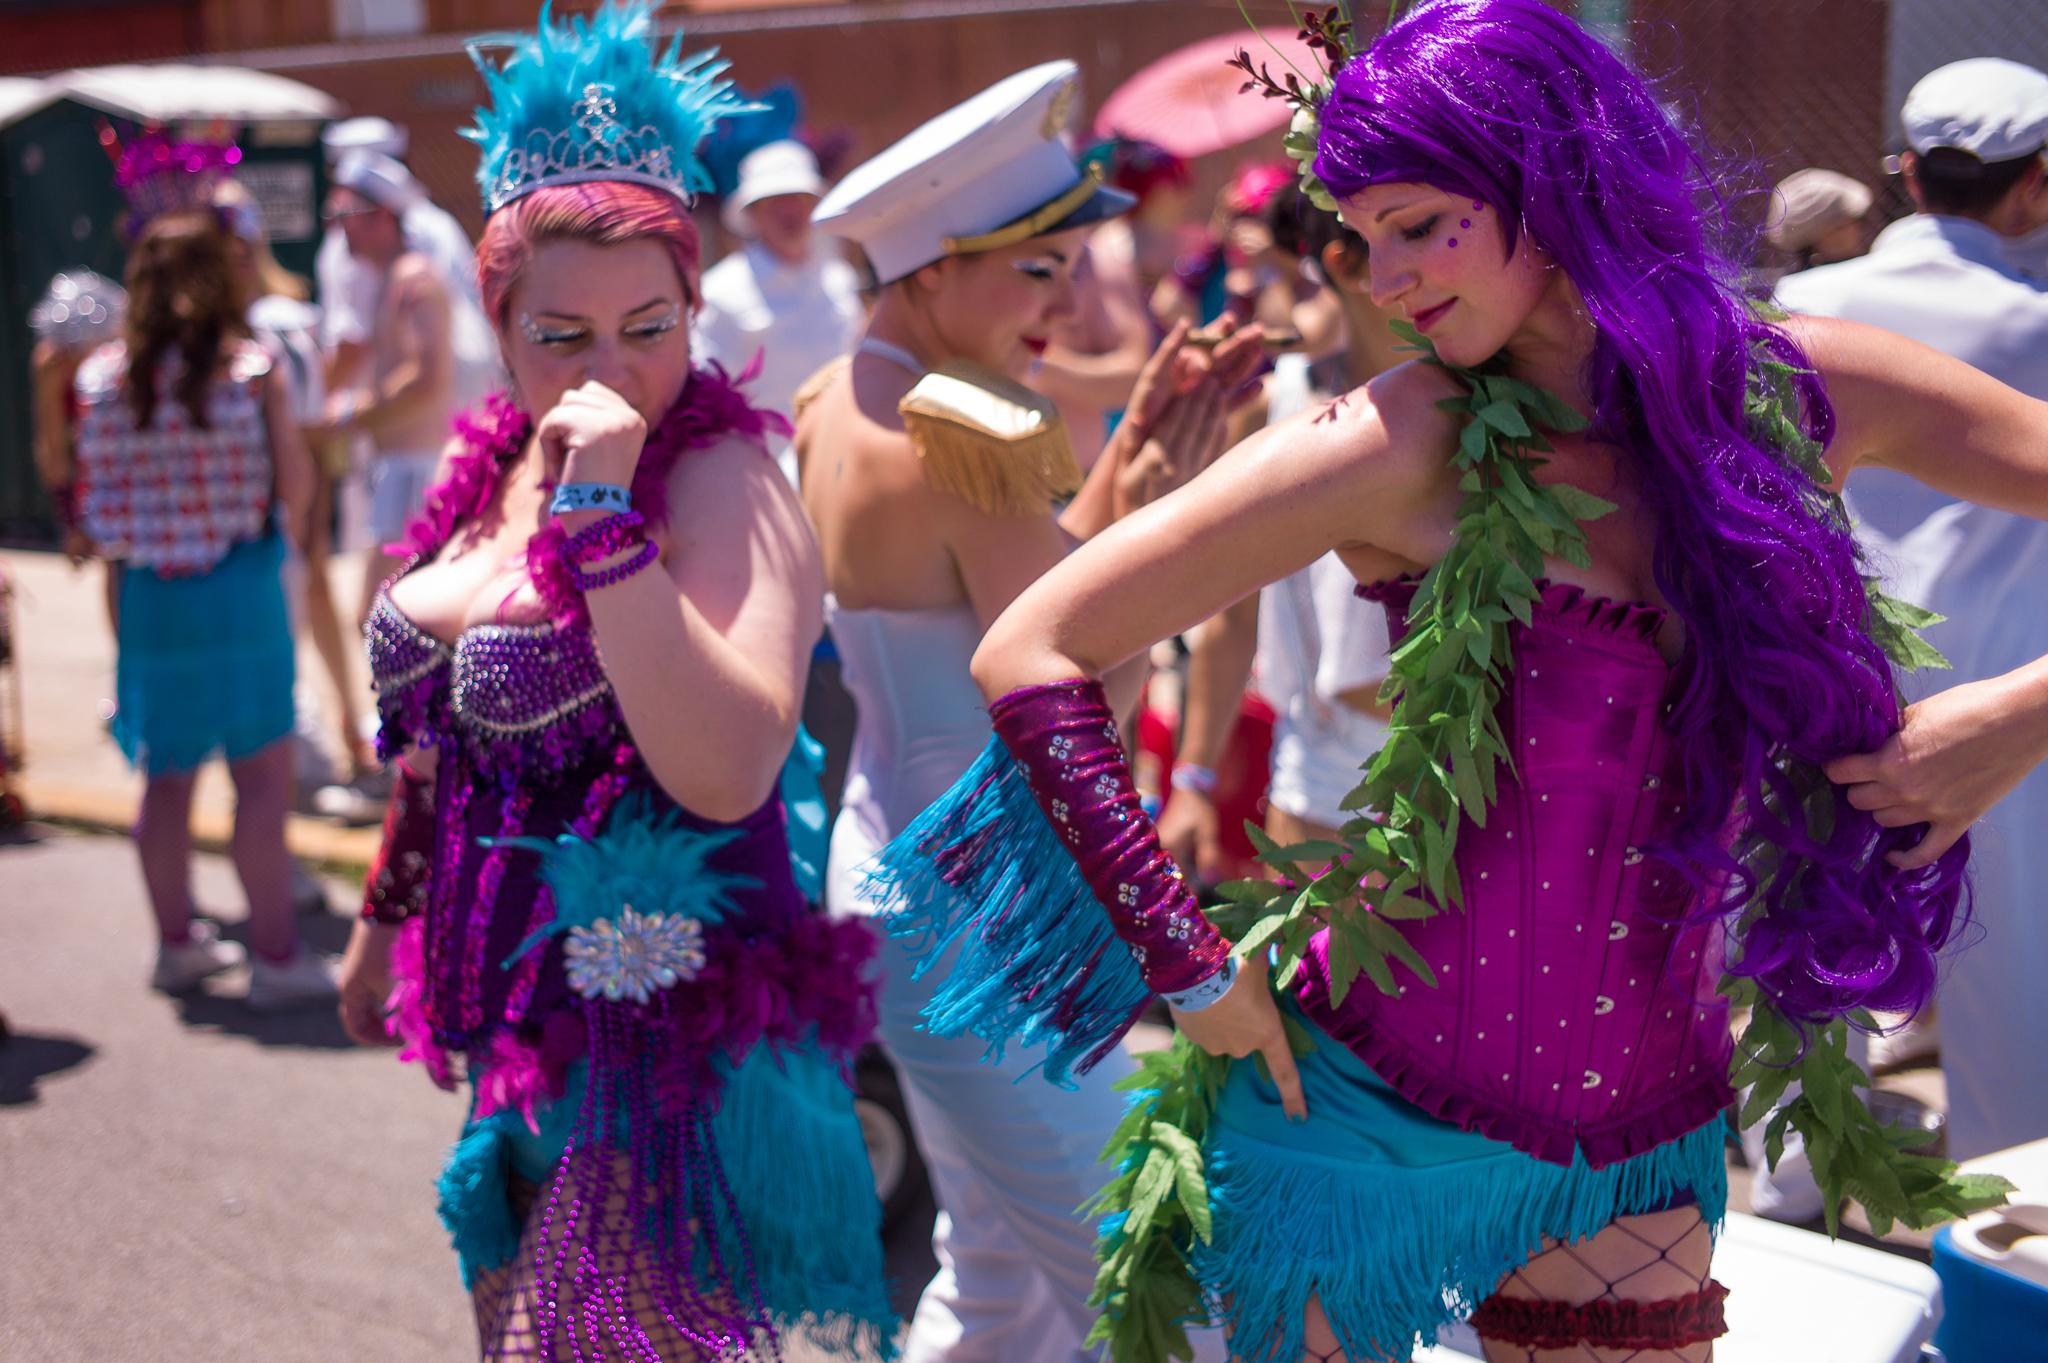 mermaid_parade_2014_016.jpg